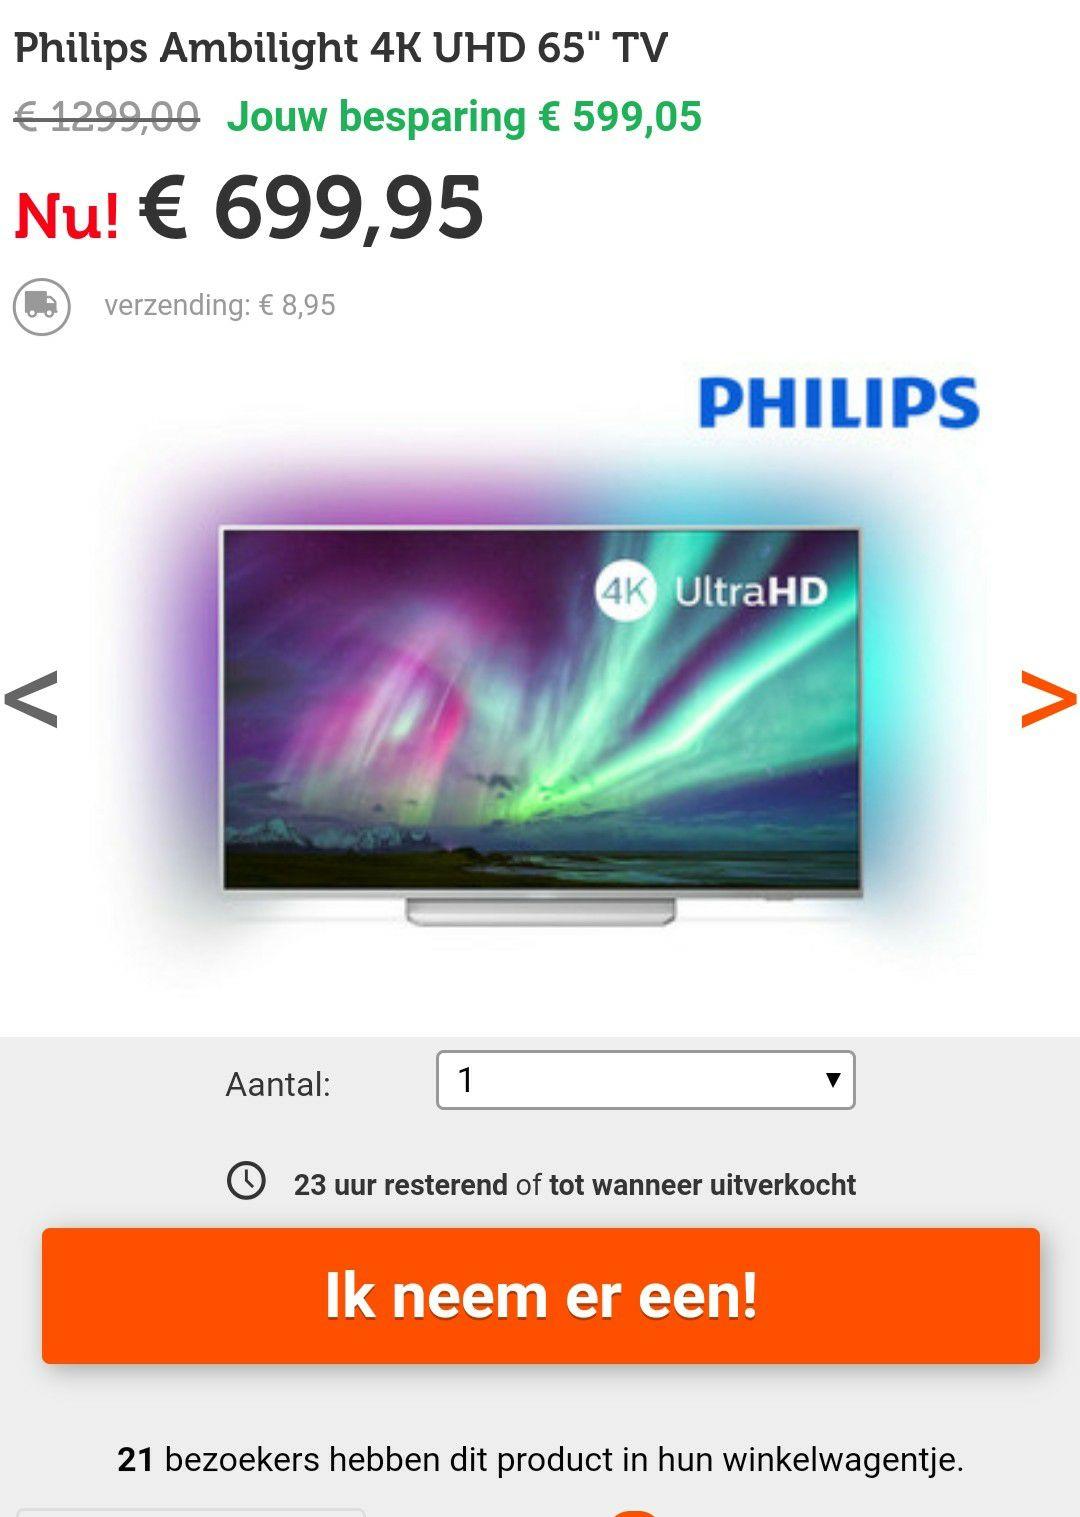 65 inch Philips Ambilight 4K UHD TV